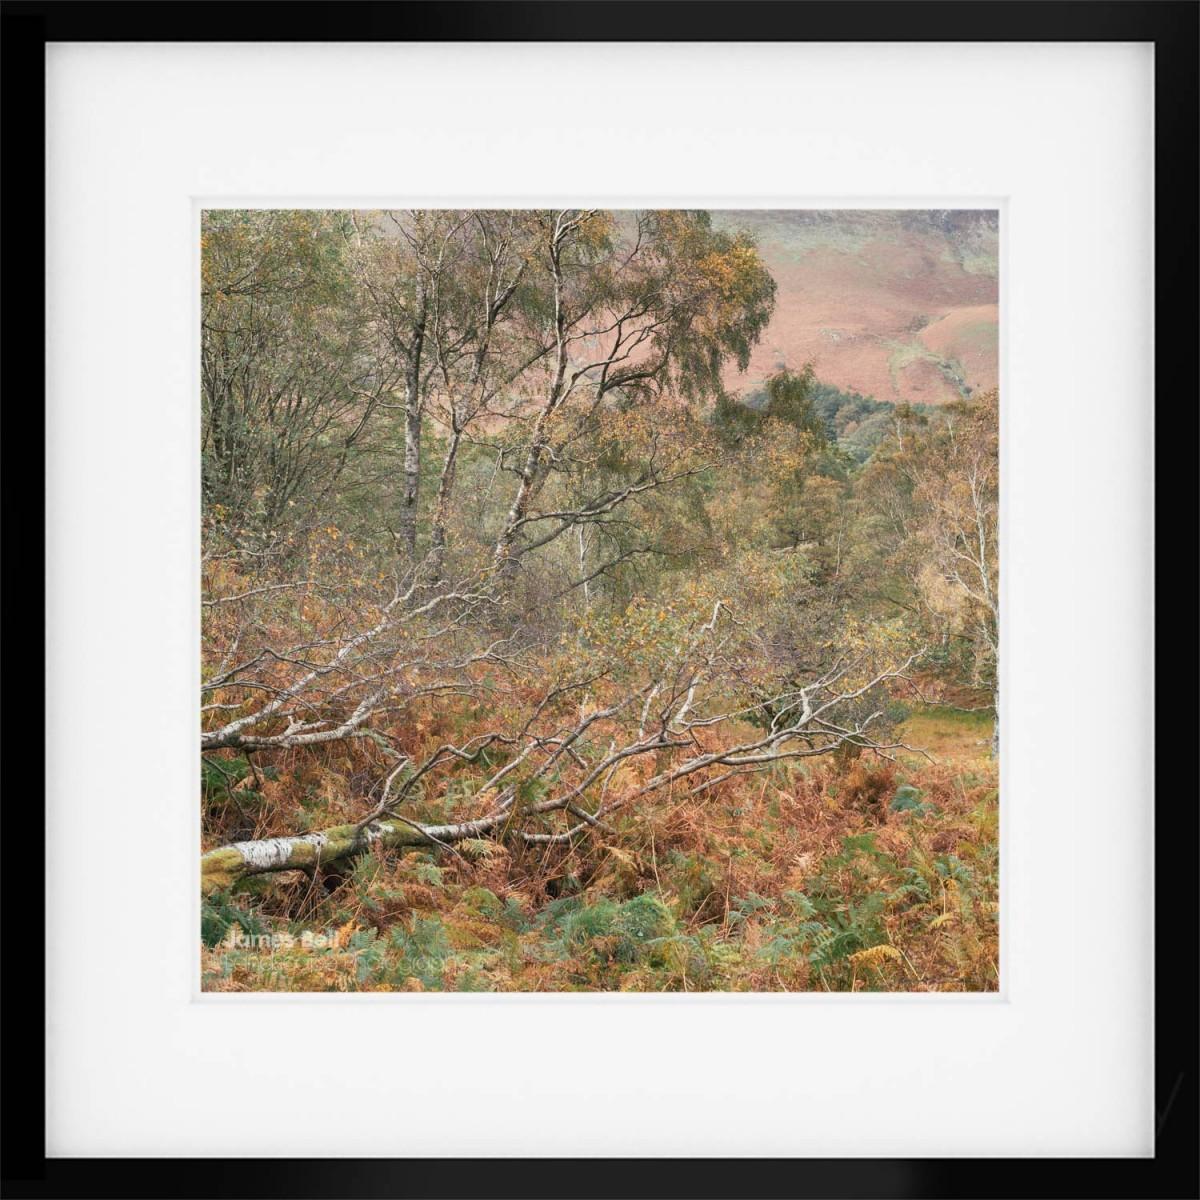 Borrowdale Autumn Details framed print